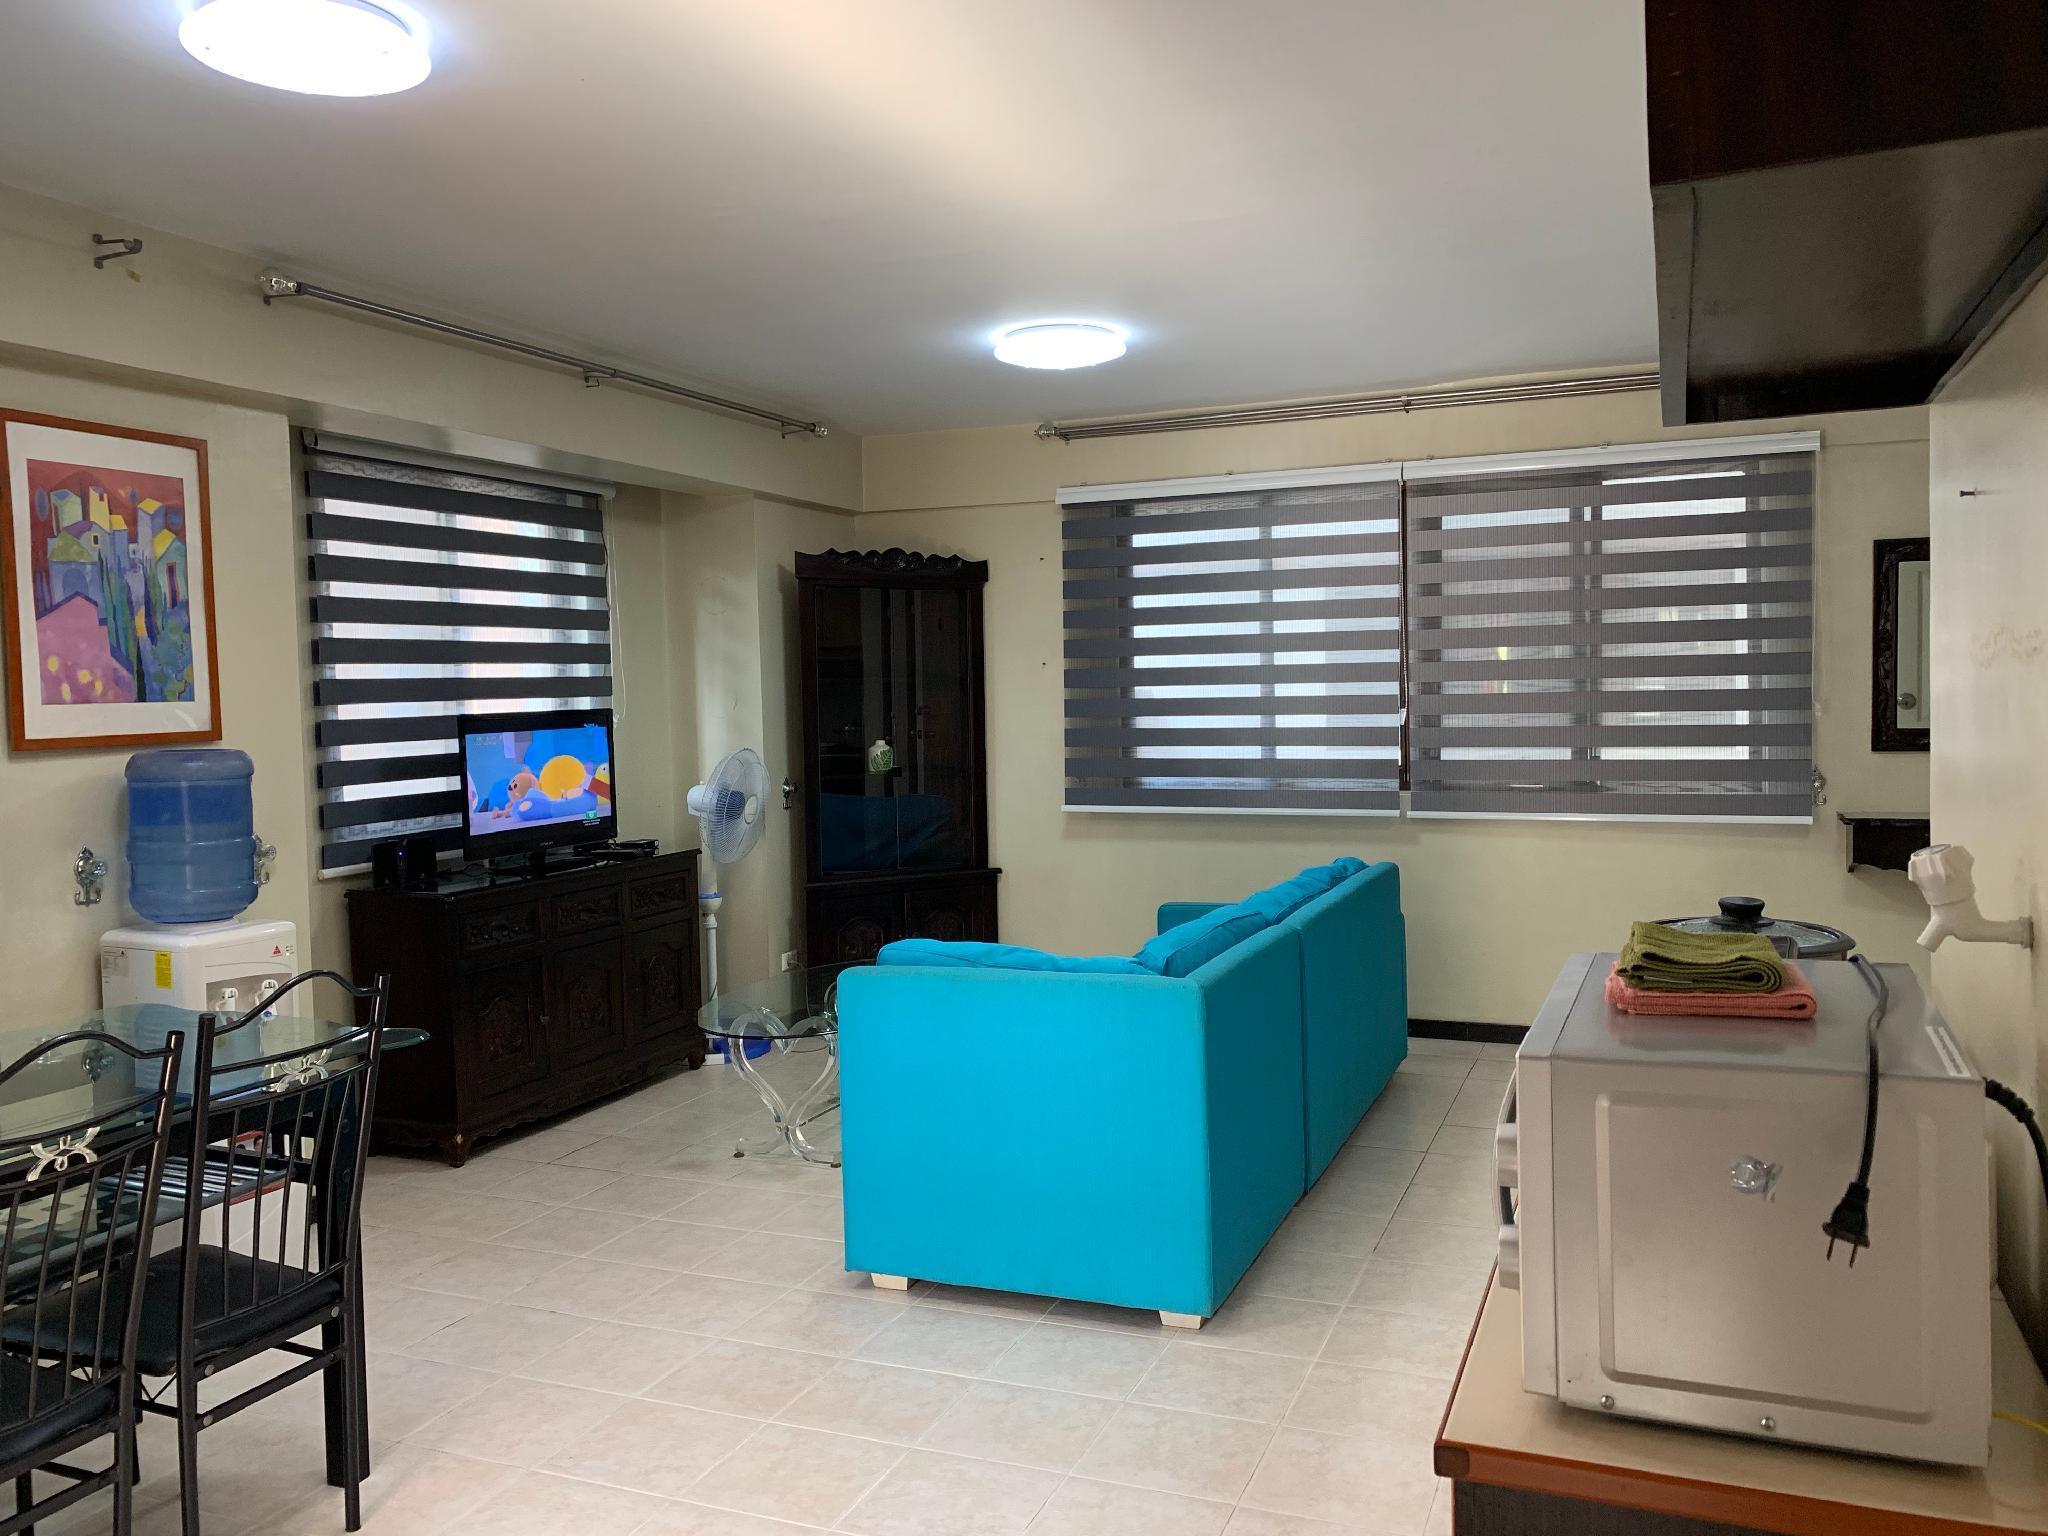 2 Br Condo Unit W Balcony In Pasig Cainta 64sqm Apartment